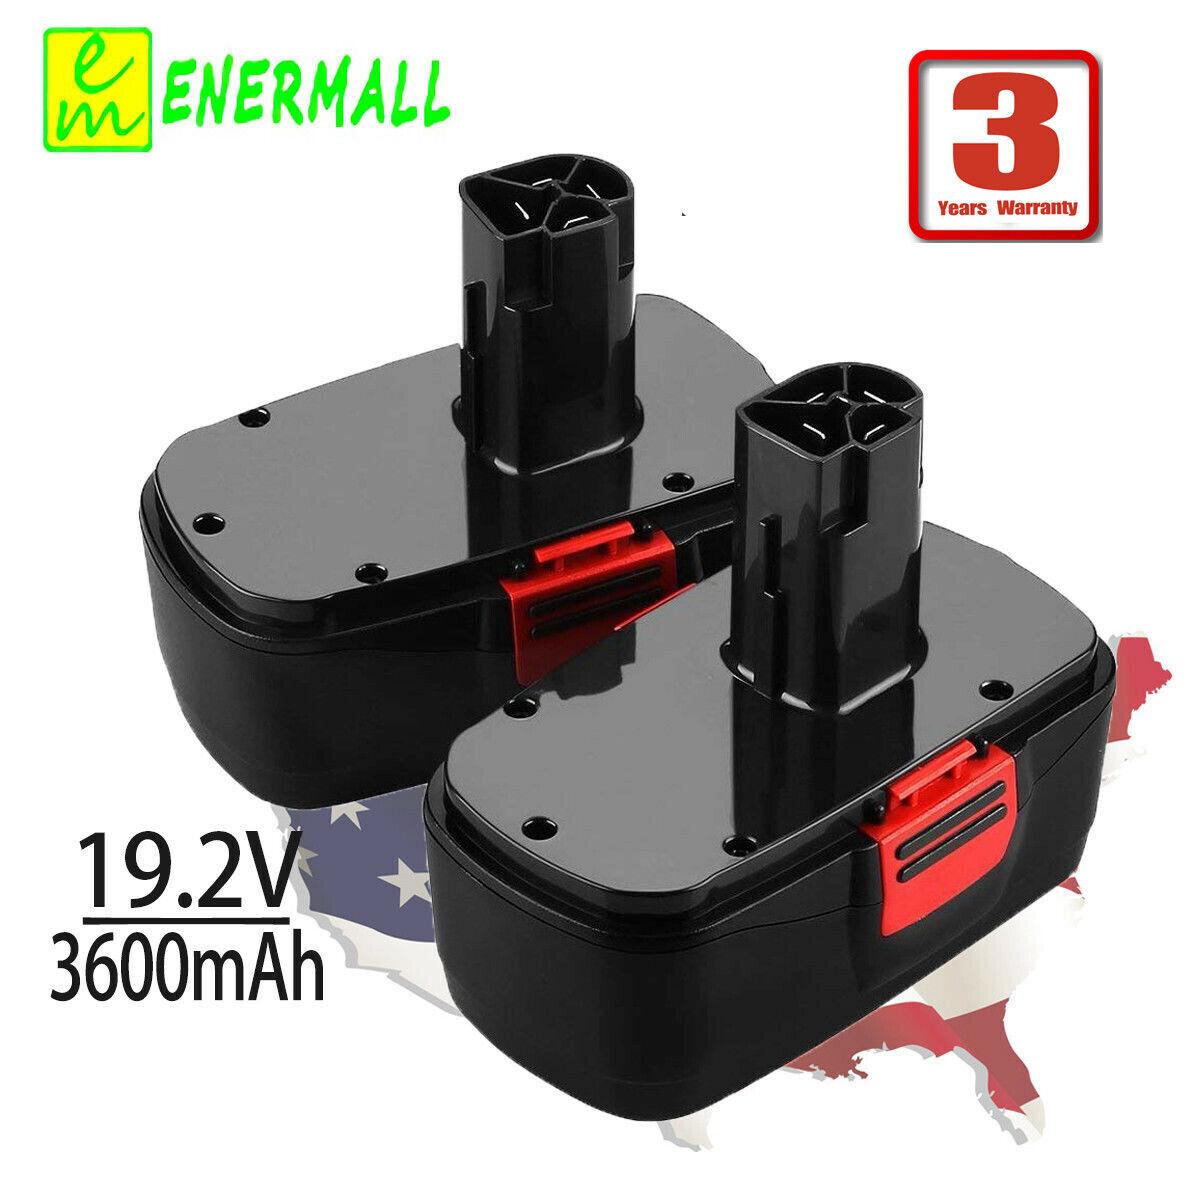 2X 3.6Ah For Craftsman 19.2V DieHard C3 Battery Ni-MH 130279